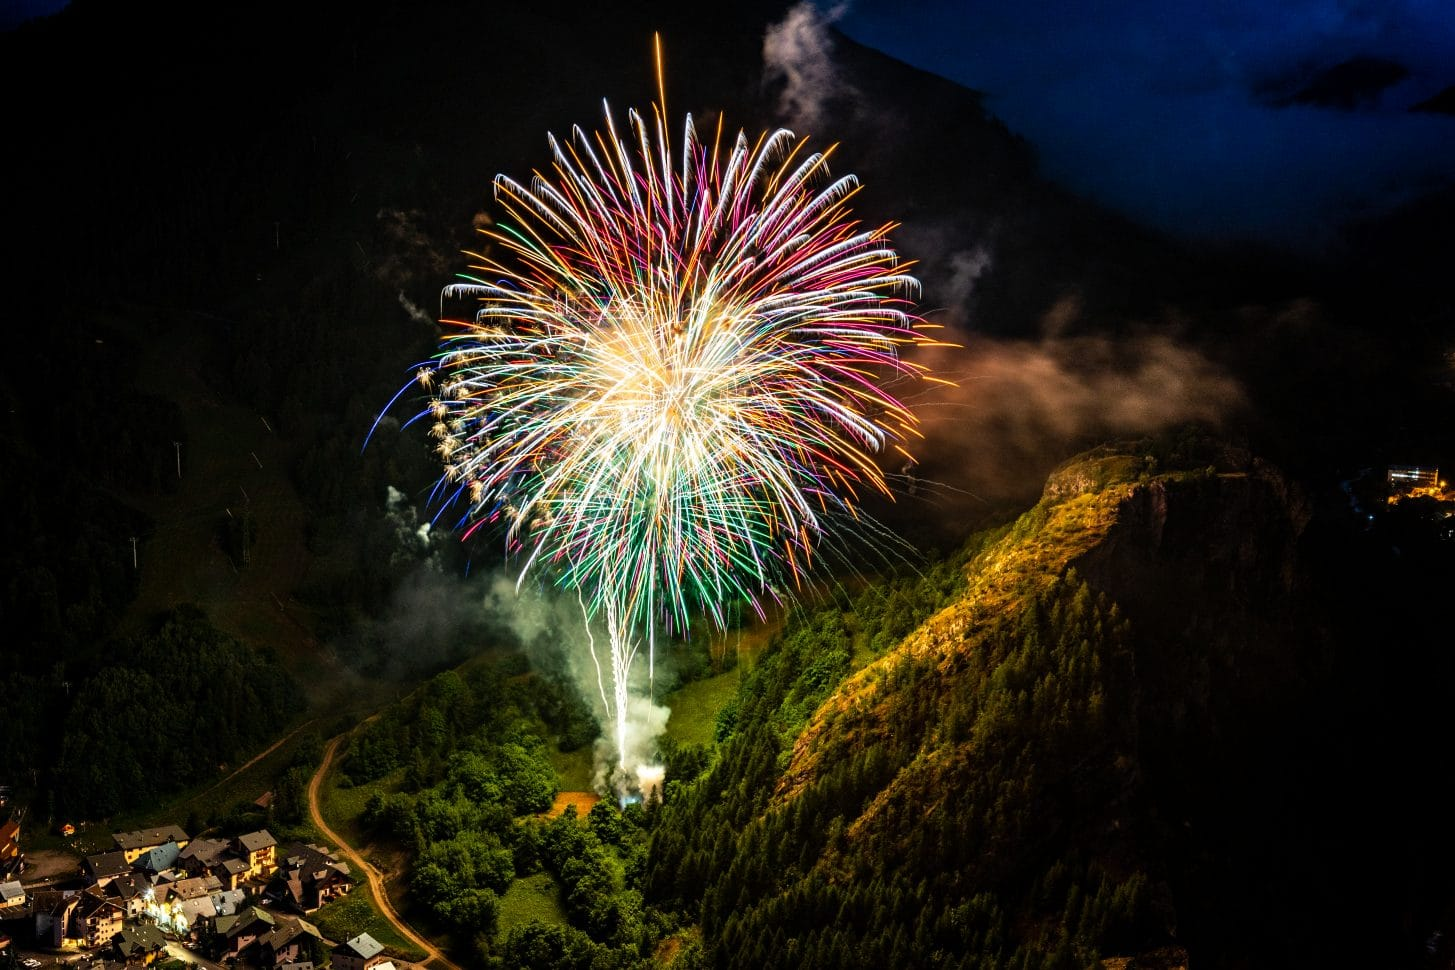 Feu d'Artifice 14 juillet 2021 à Valloire